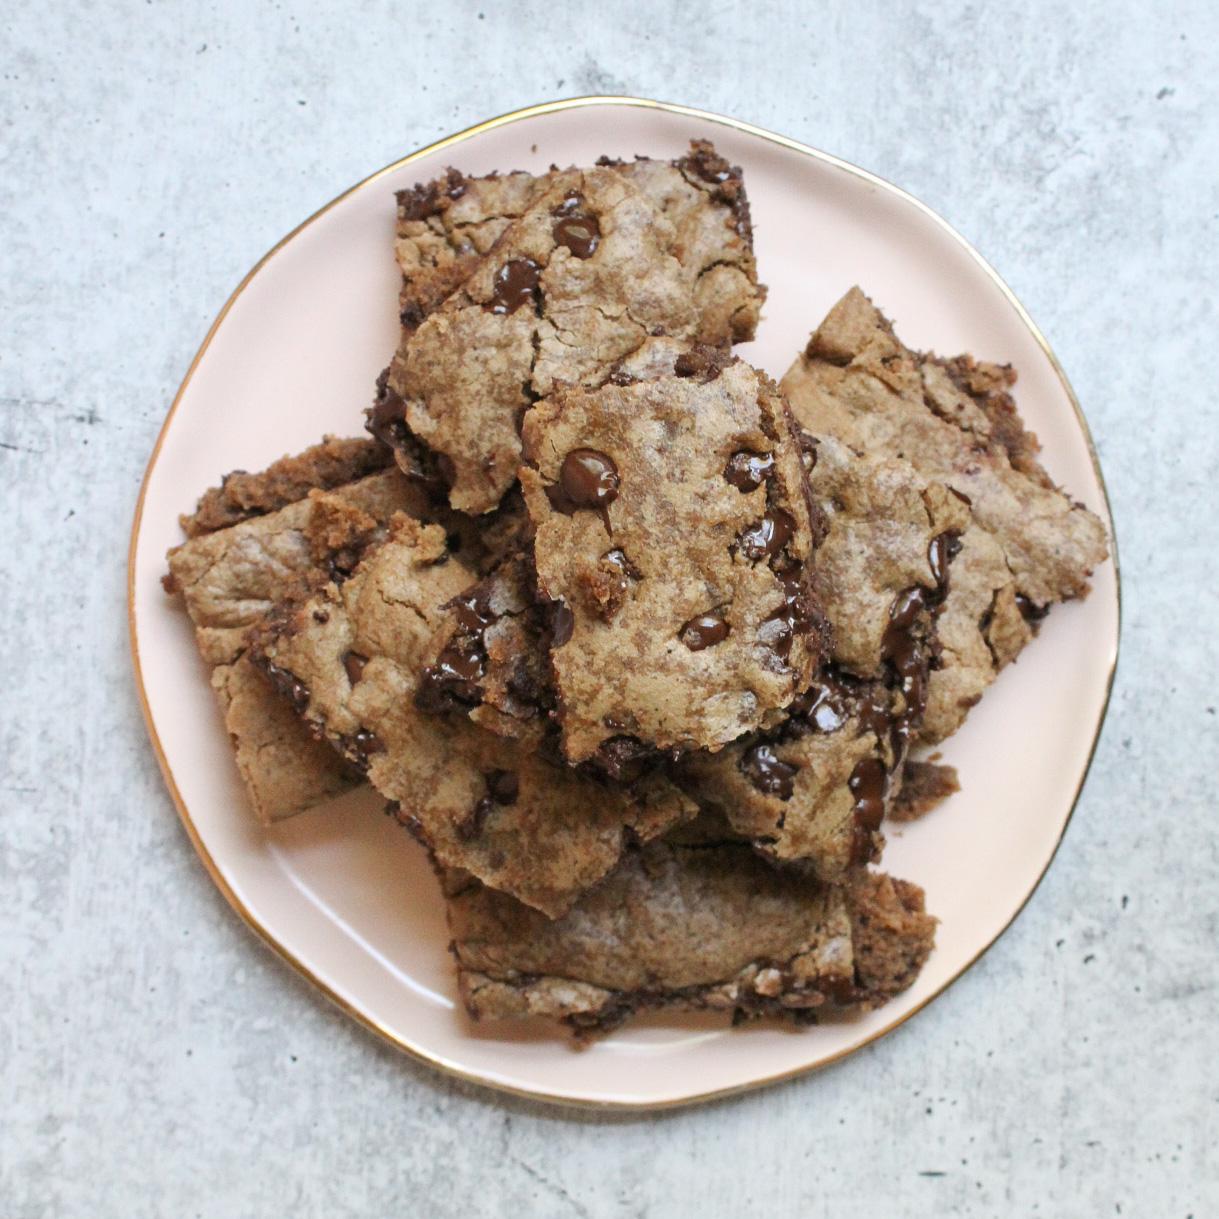 Vegan Mocha Chocolate Chip Cookies Cookie Bars Coffee Featured Image